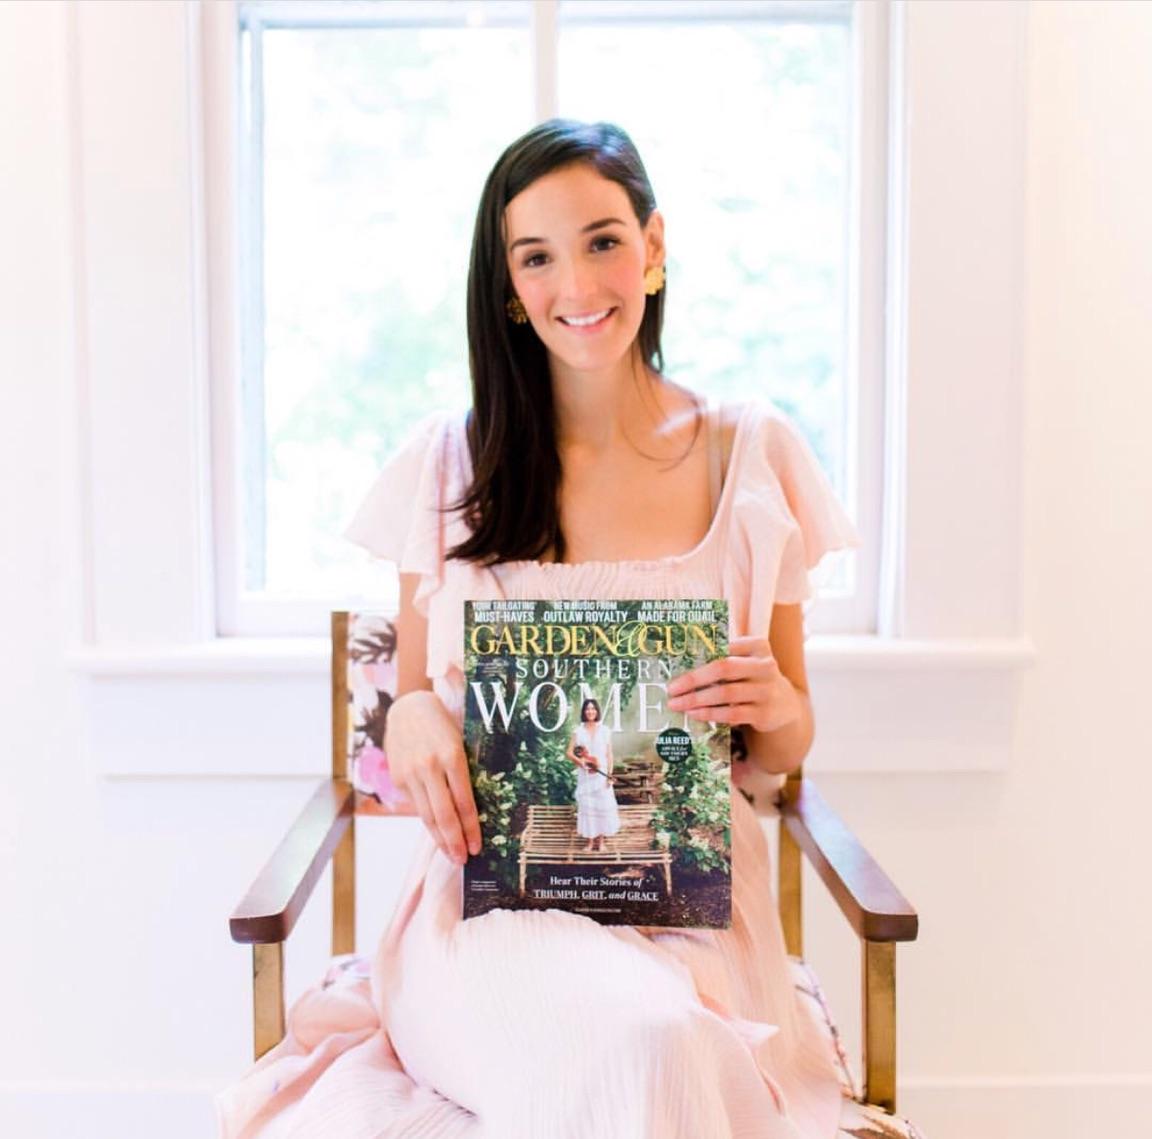 Shain holding a copy of Garden & Gun Magazine